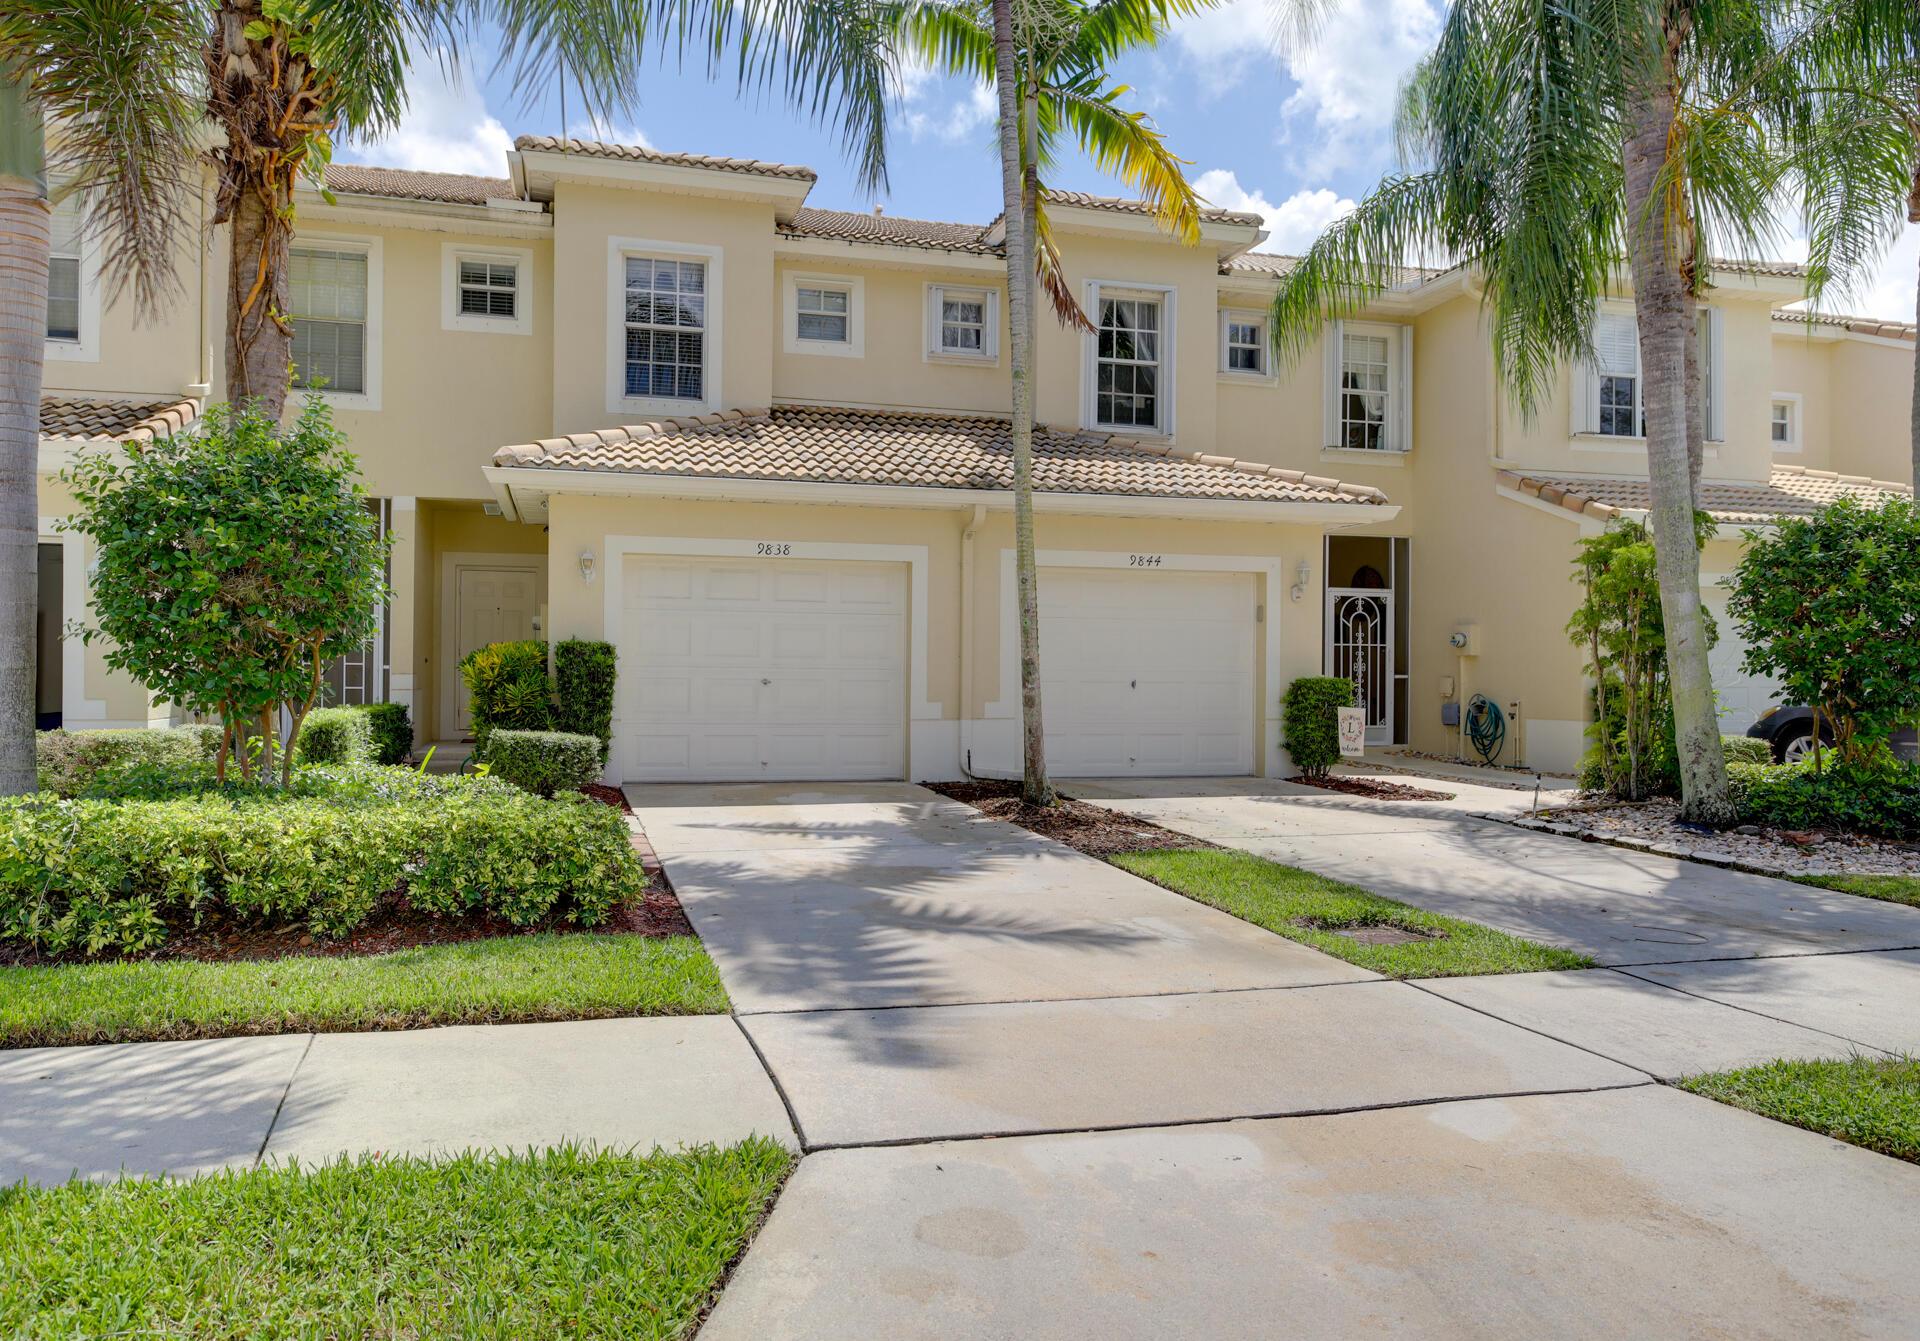 9838  Porta Leona Lane  For Sale 10750040, FL